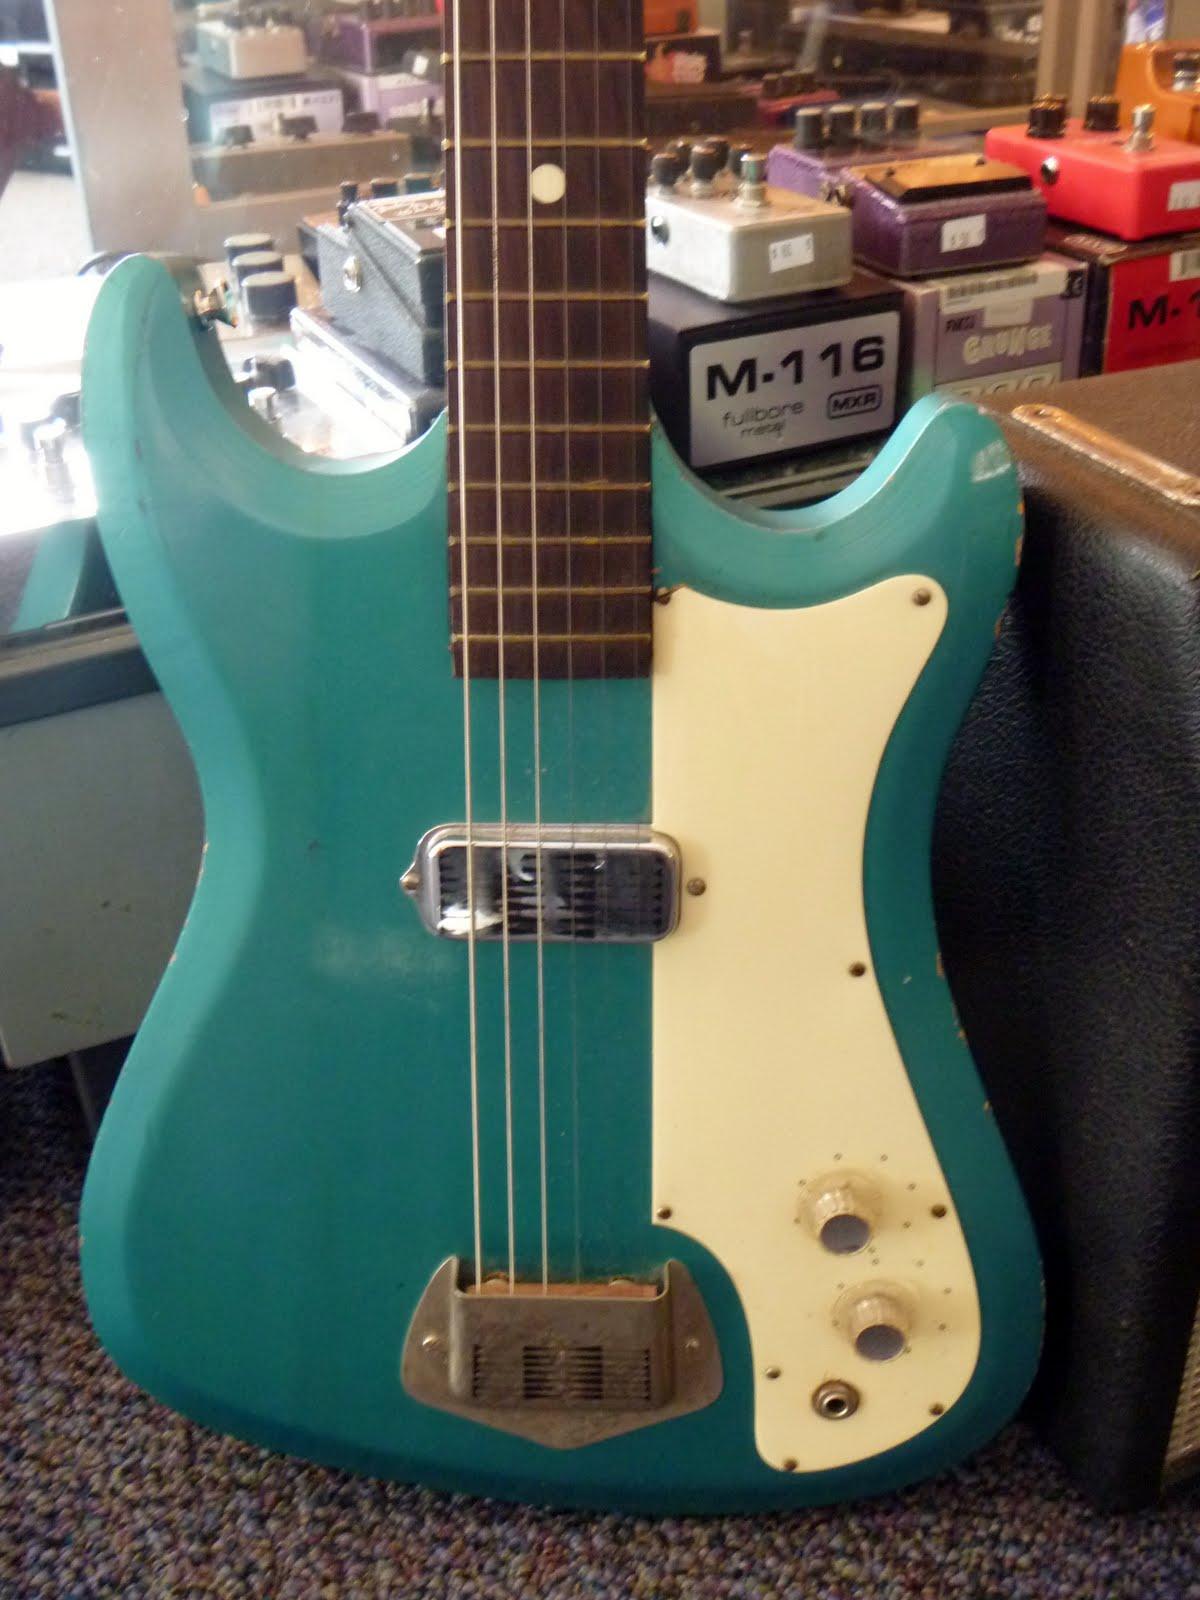 Wood & Wire Guitar Shop Blog: 2011